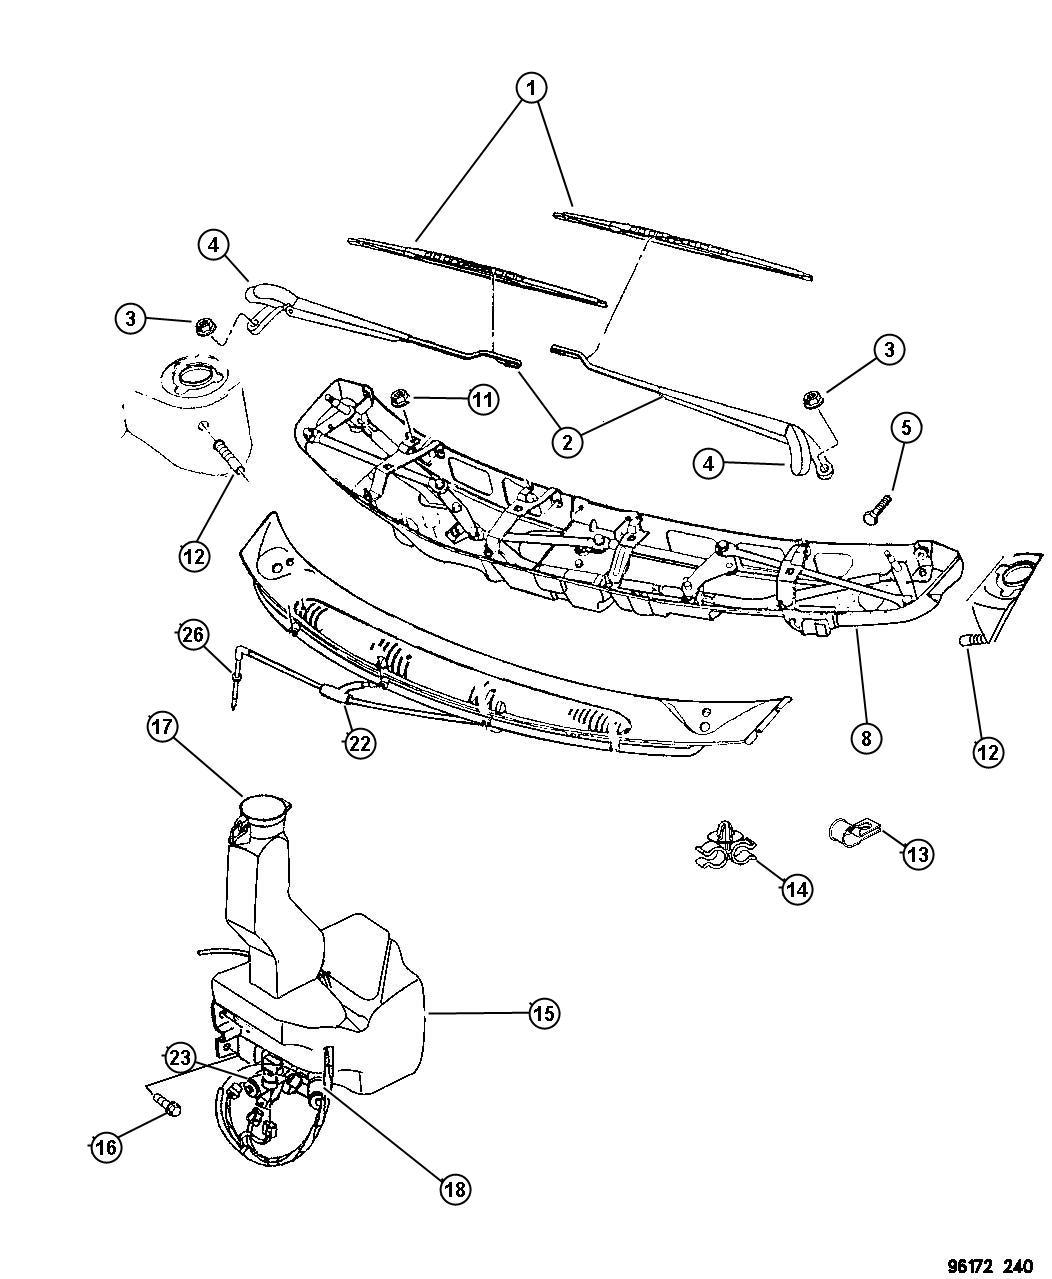 Dodge Grand Caravan Nozzle Washer Windshield Body